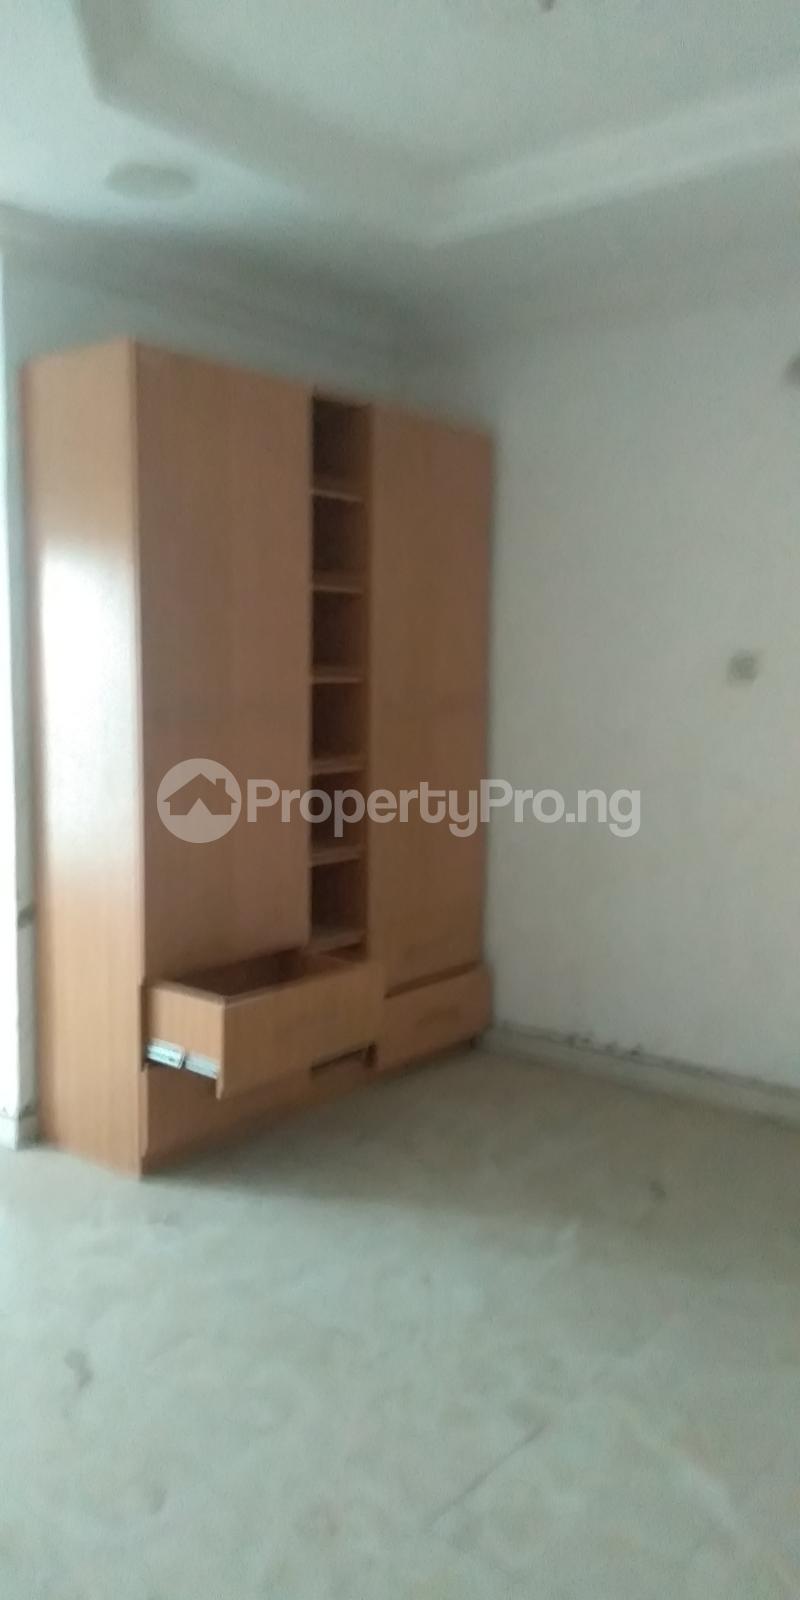 5 bedroom Land for sale Bashiru shittu street magodo shangisha Magodo GRA Phase 2 Kosofe/Ikosi Lagos - 5